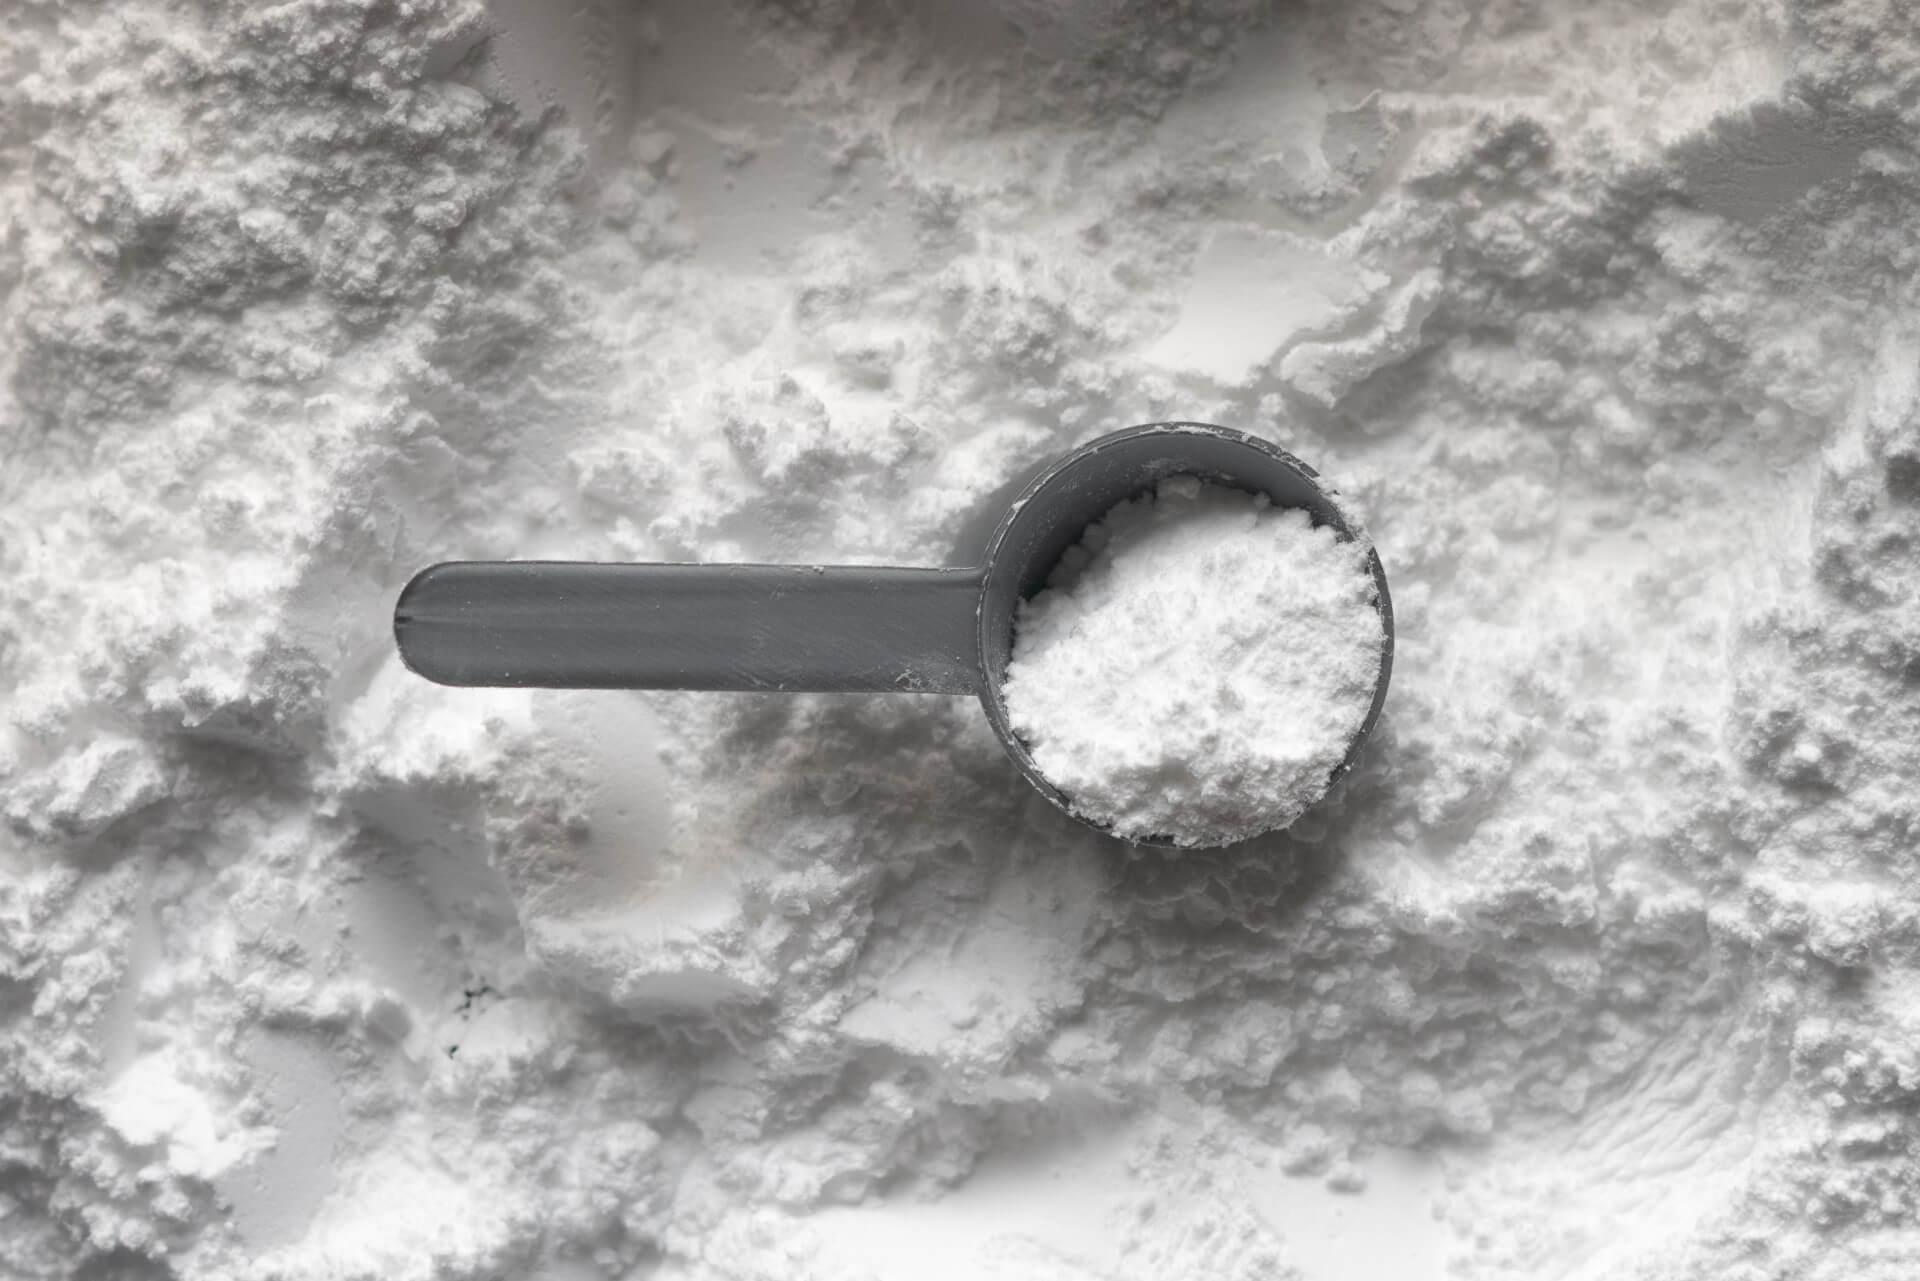 Creatine monohydrate in powder form